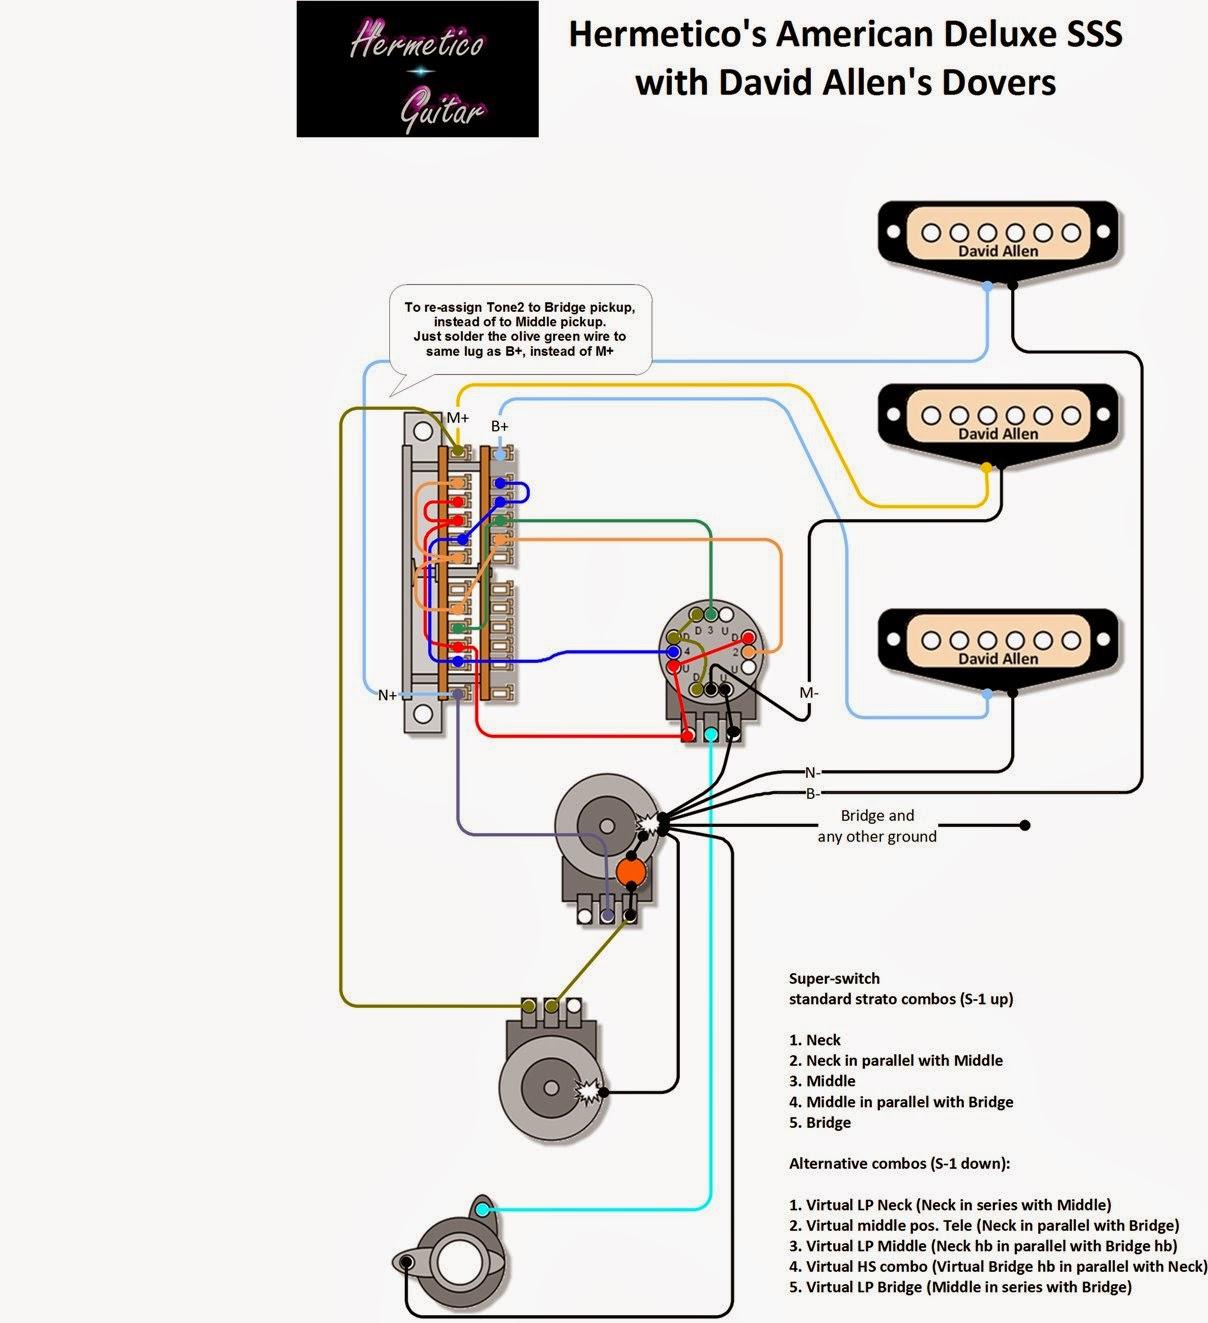 Dean Ml Wiring Diagram Electrical Guitars Pickup Dimarzio Area 58 Diagrams Bose Zakk Wylde From Hell